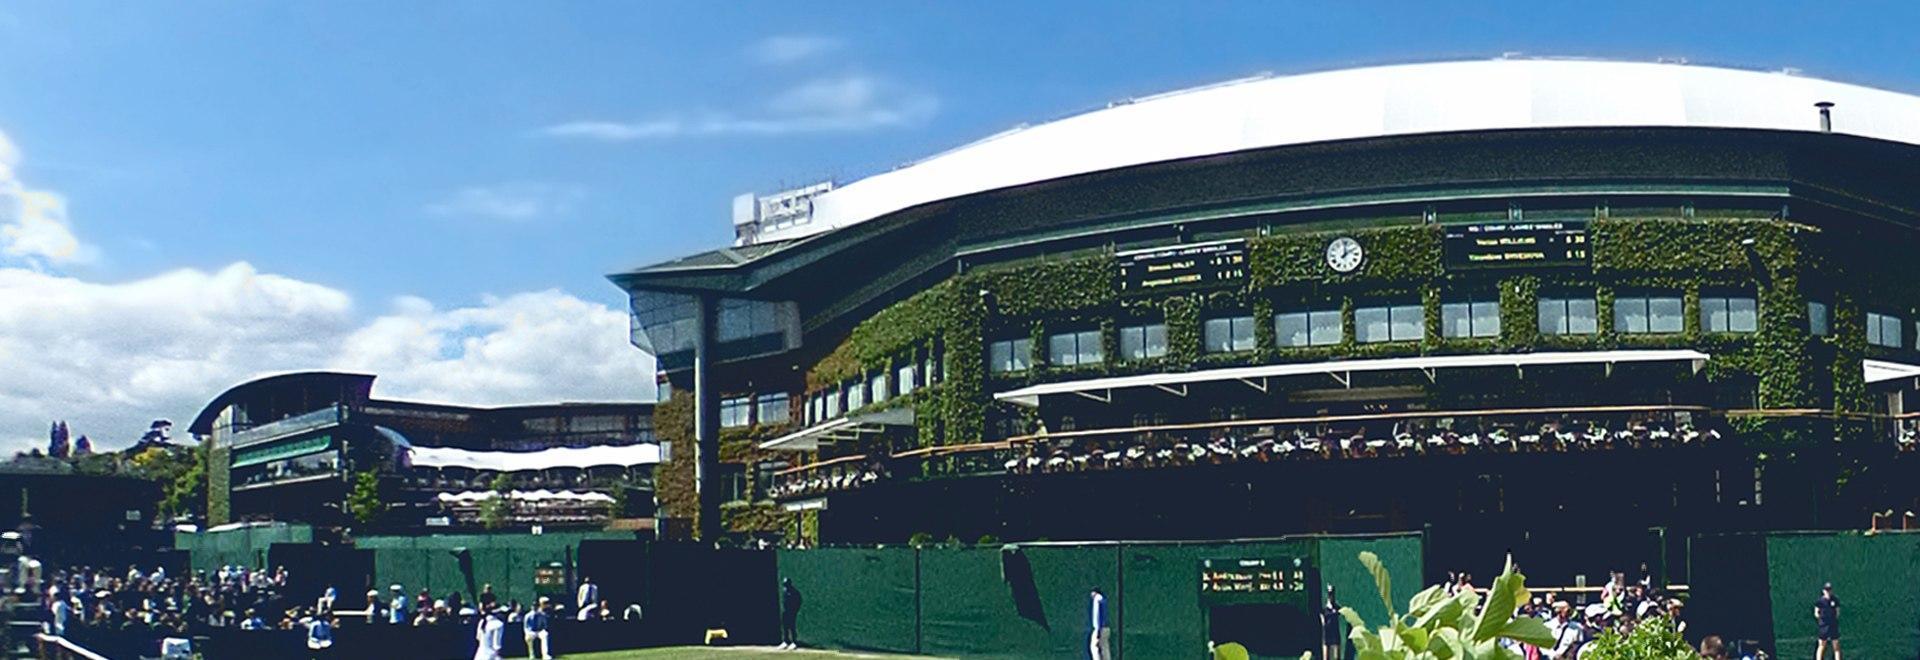 Wimbledon: Raonic - Murray 2016